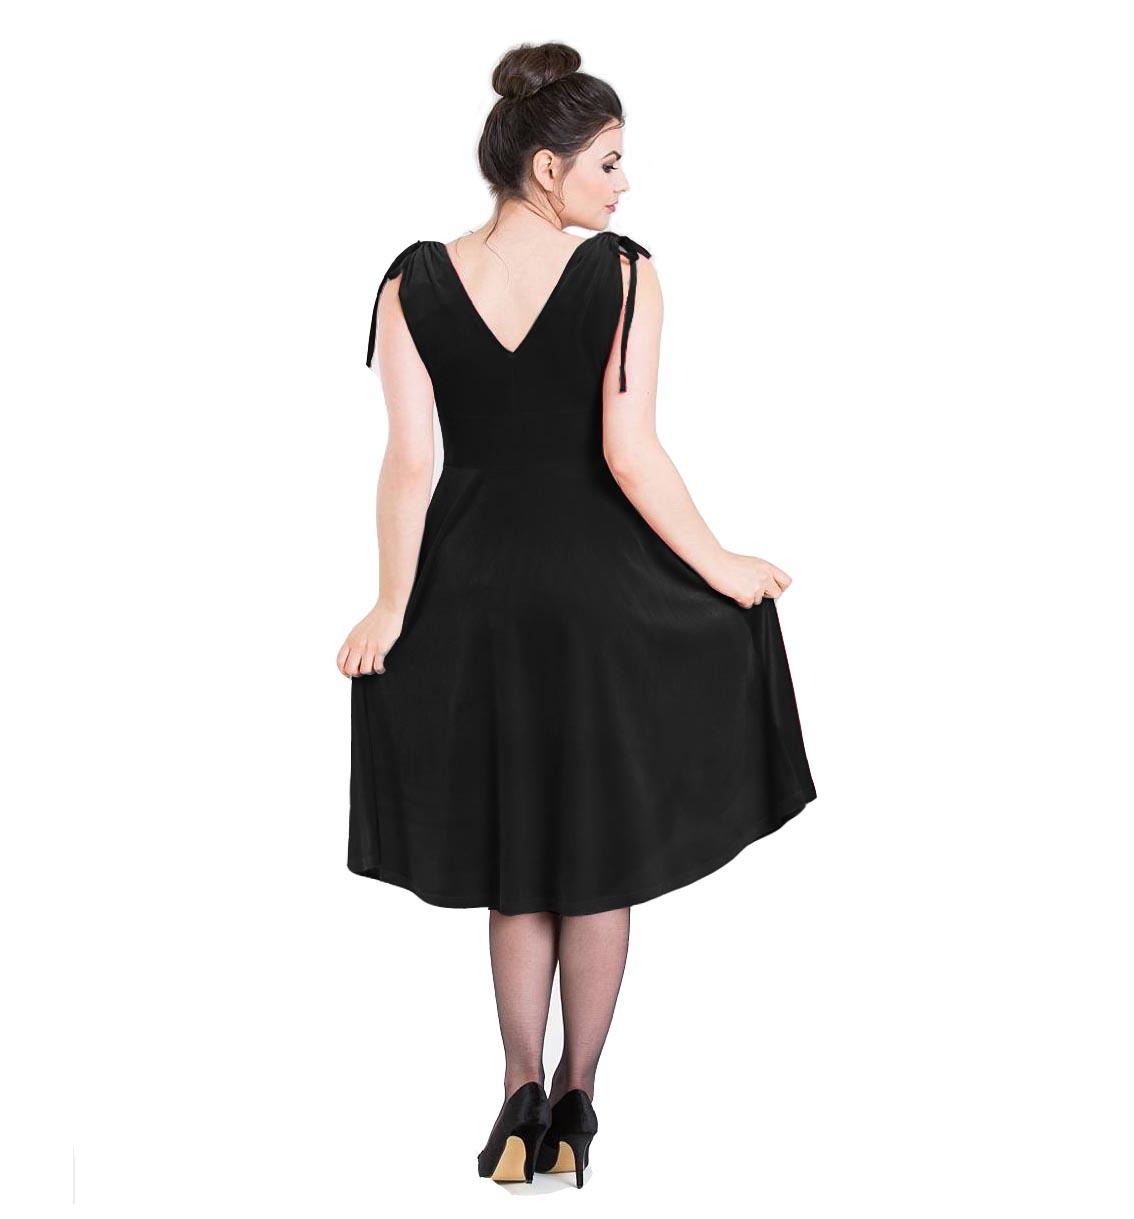 Hell-Bunny-40s-50s-Elegant-Pin-Up-Dress-MELINA-Crushed-Velvet-Black-All-Sizes thumbnail 5